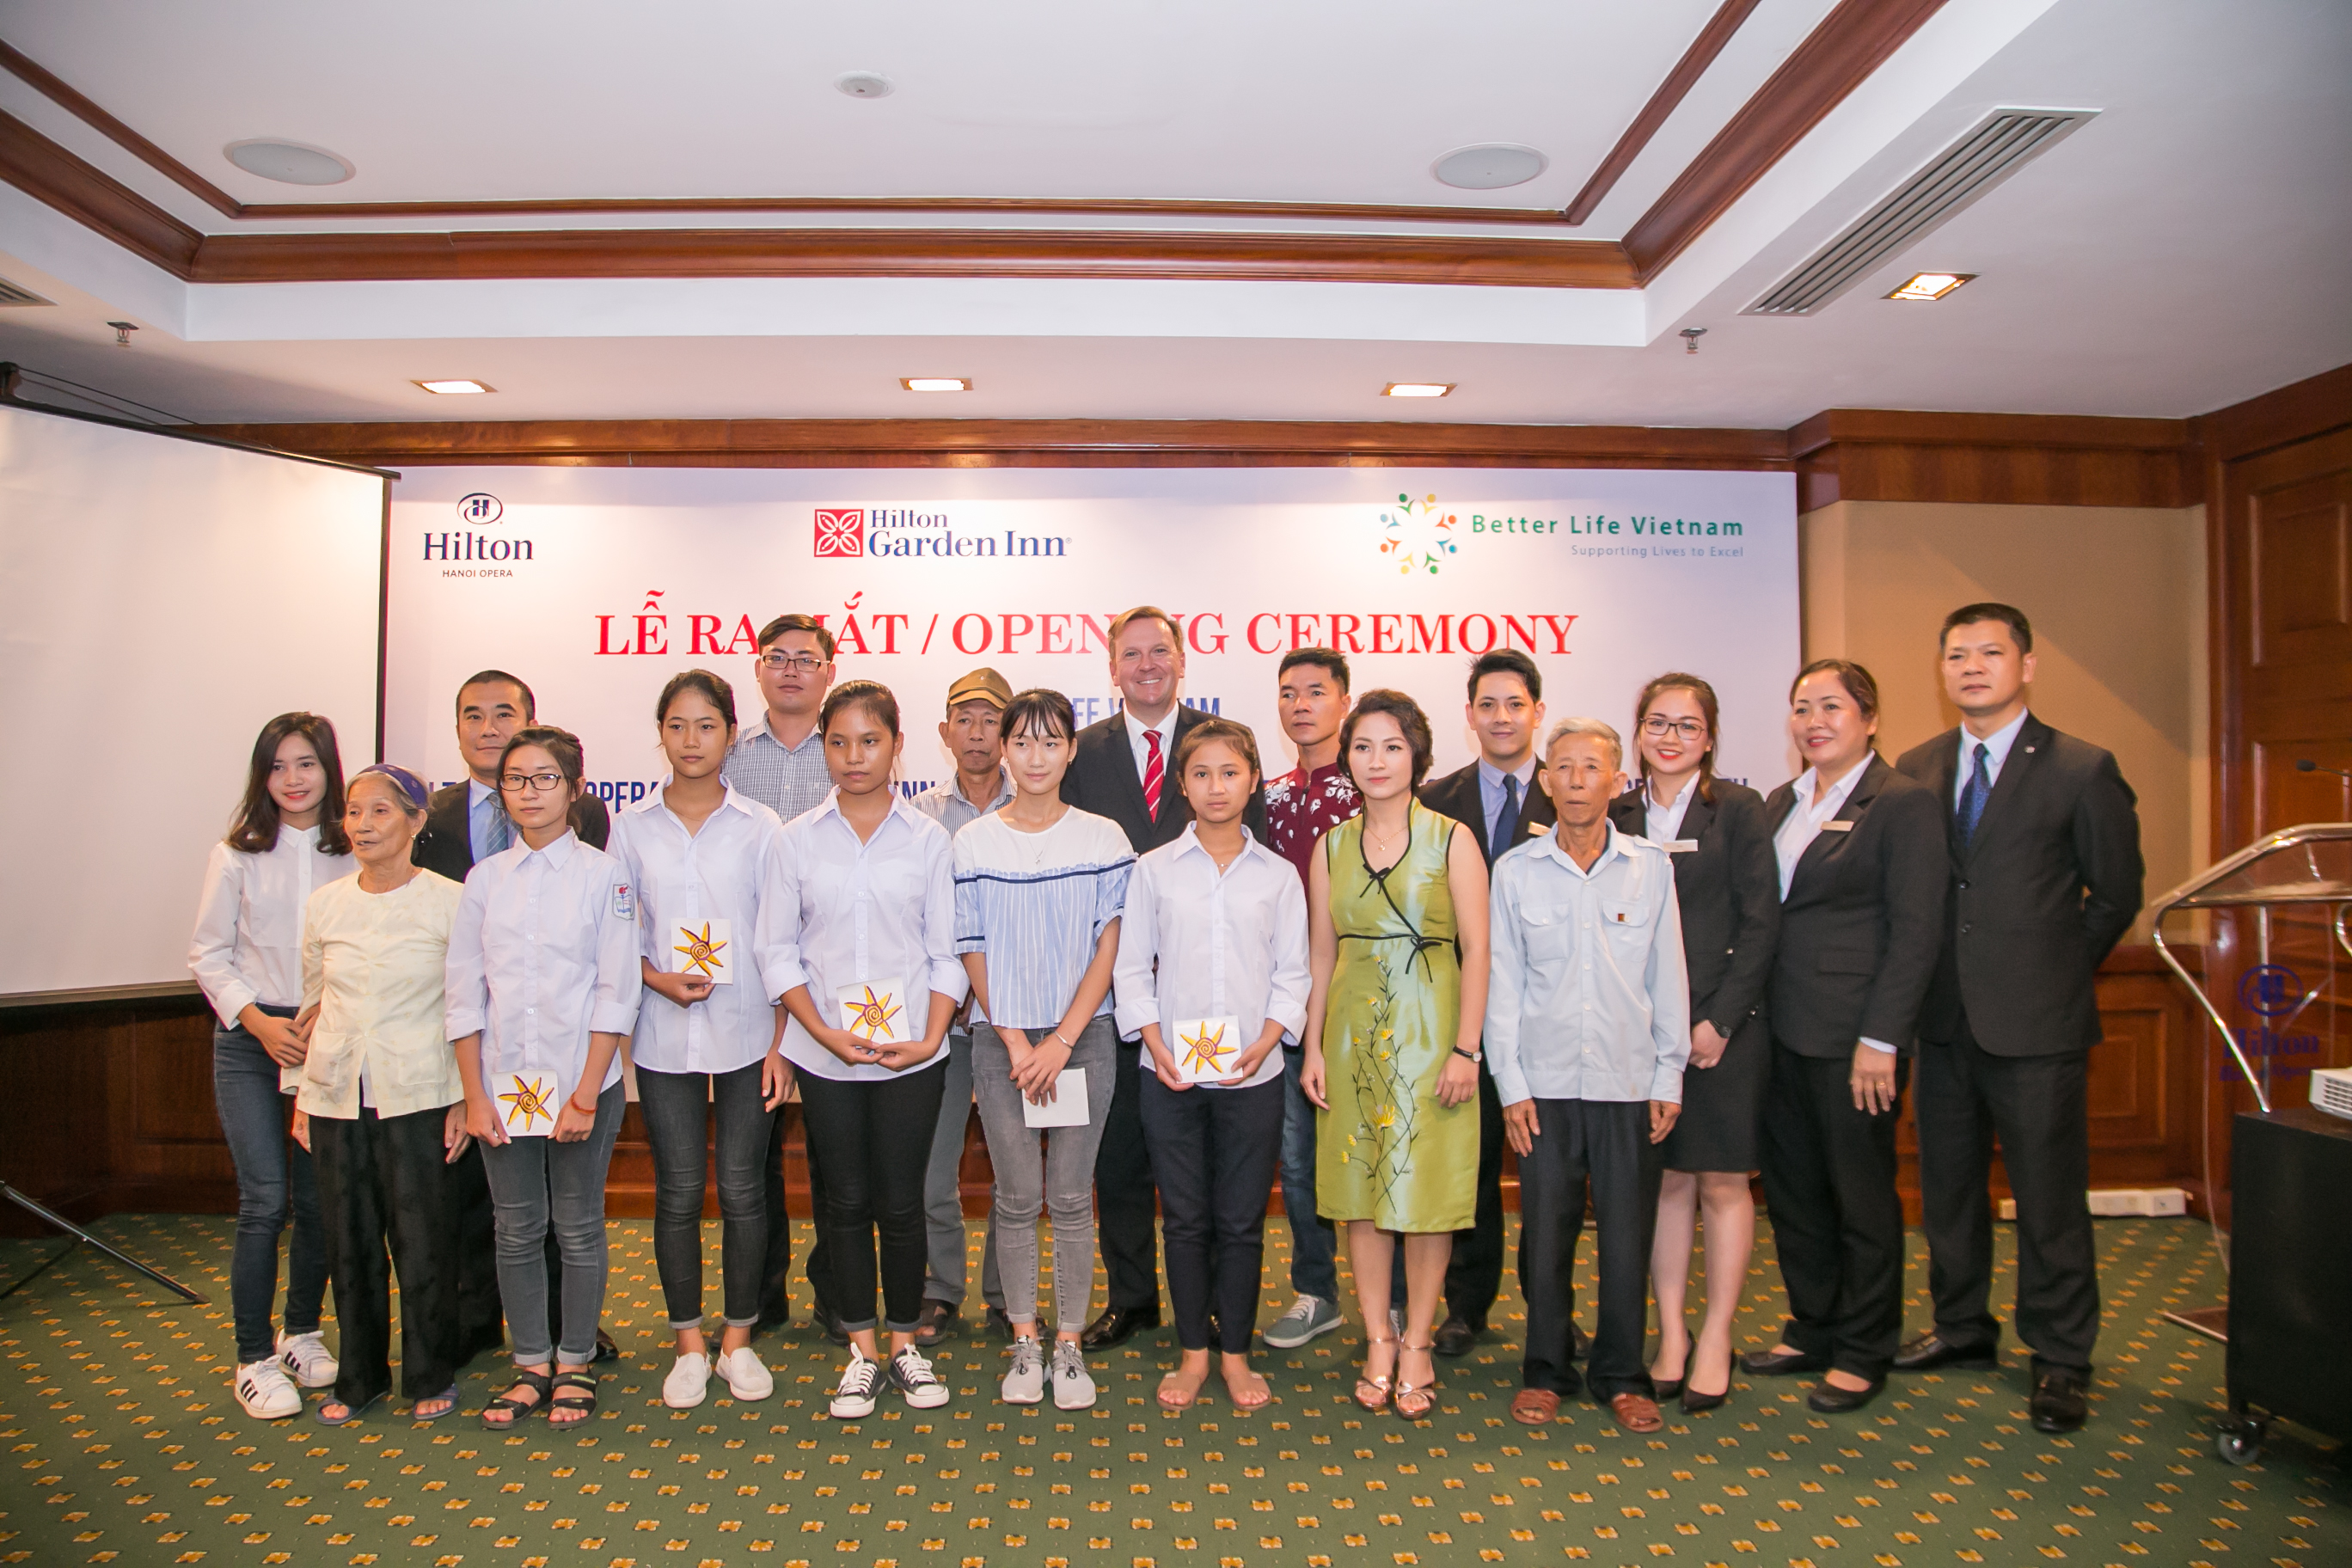 hilton hanoi opera and hilton garden inn hanoi support young people